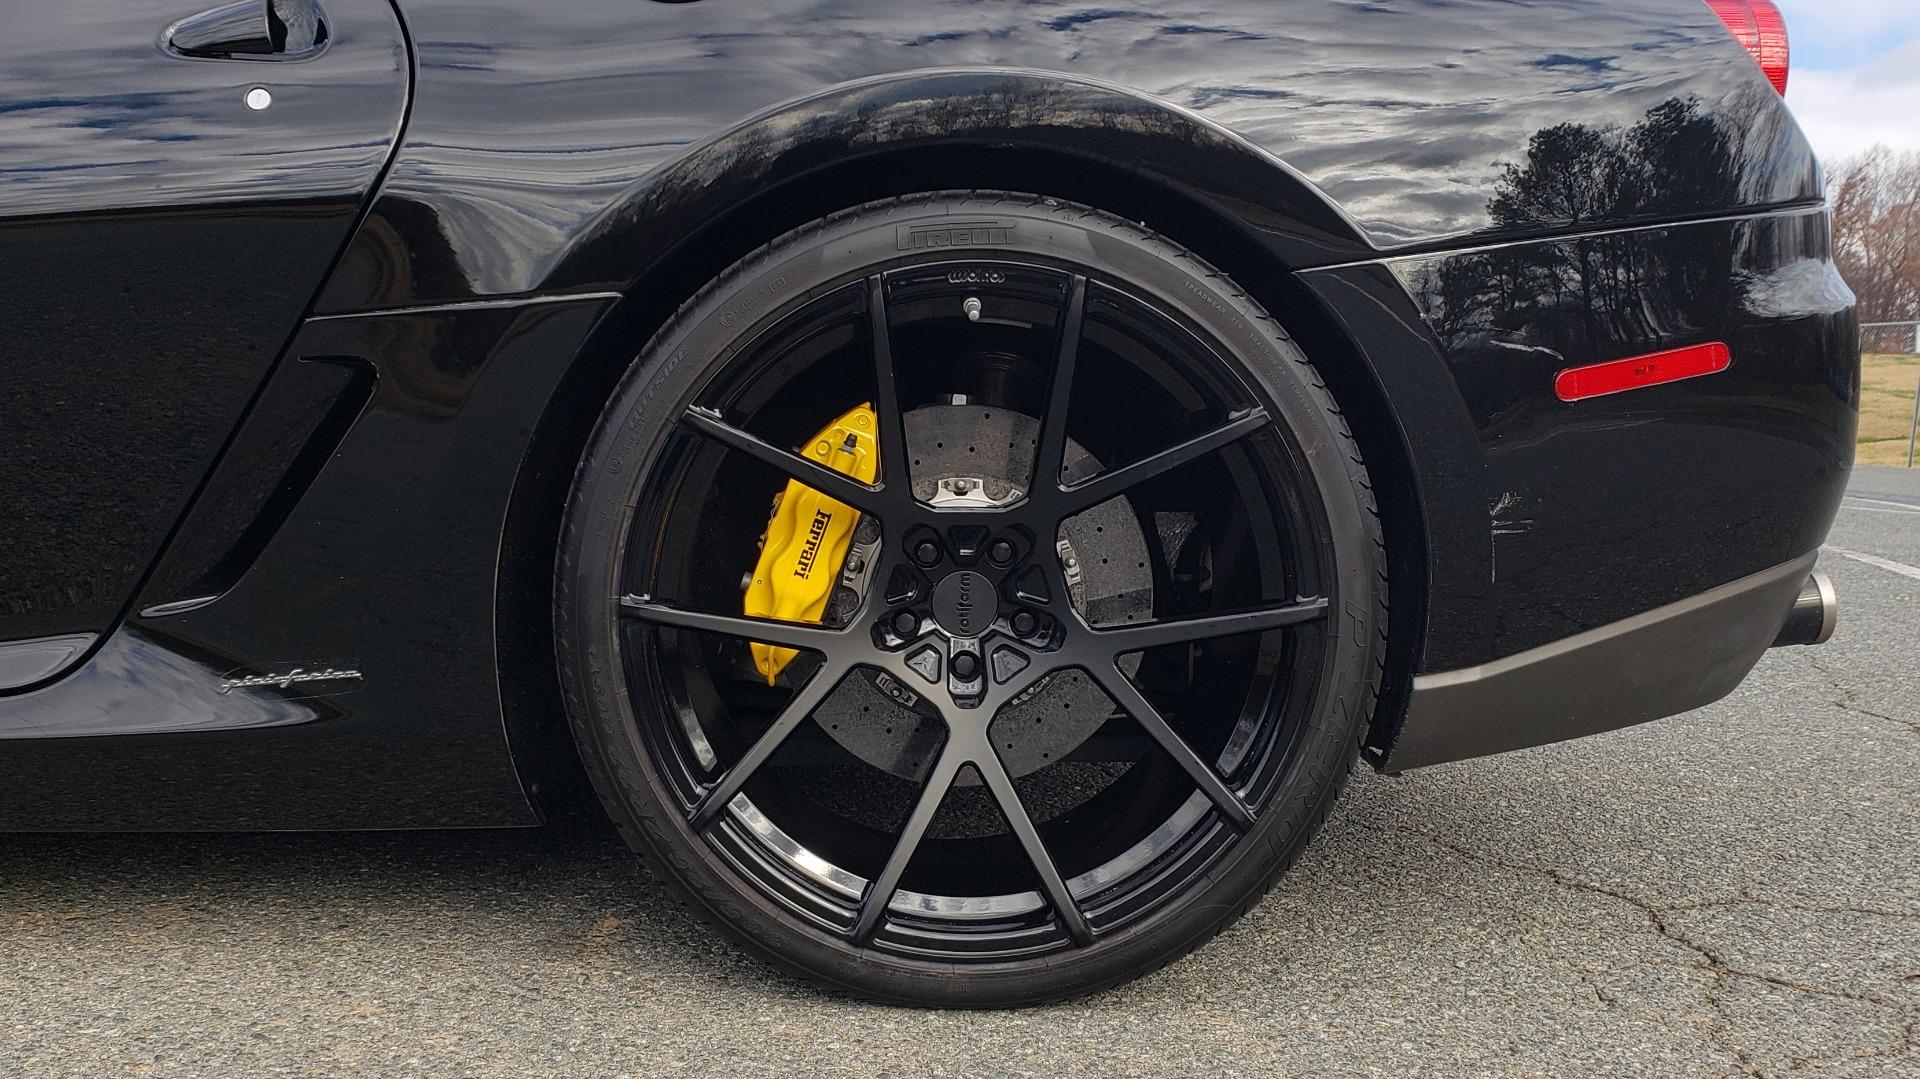 Used 2007 Ferrari 599 GTB FIORANO HGTE / V12 / F1 TRANS / NAV / BOSE / CUSTOM WHEELS for sale $109,999 at Formula Imports in Charlotte NC 28227 120